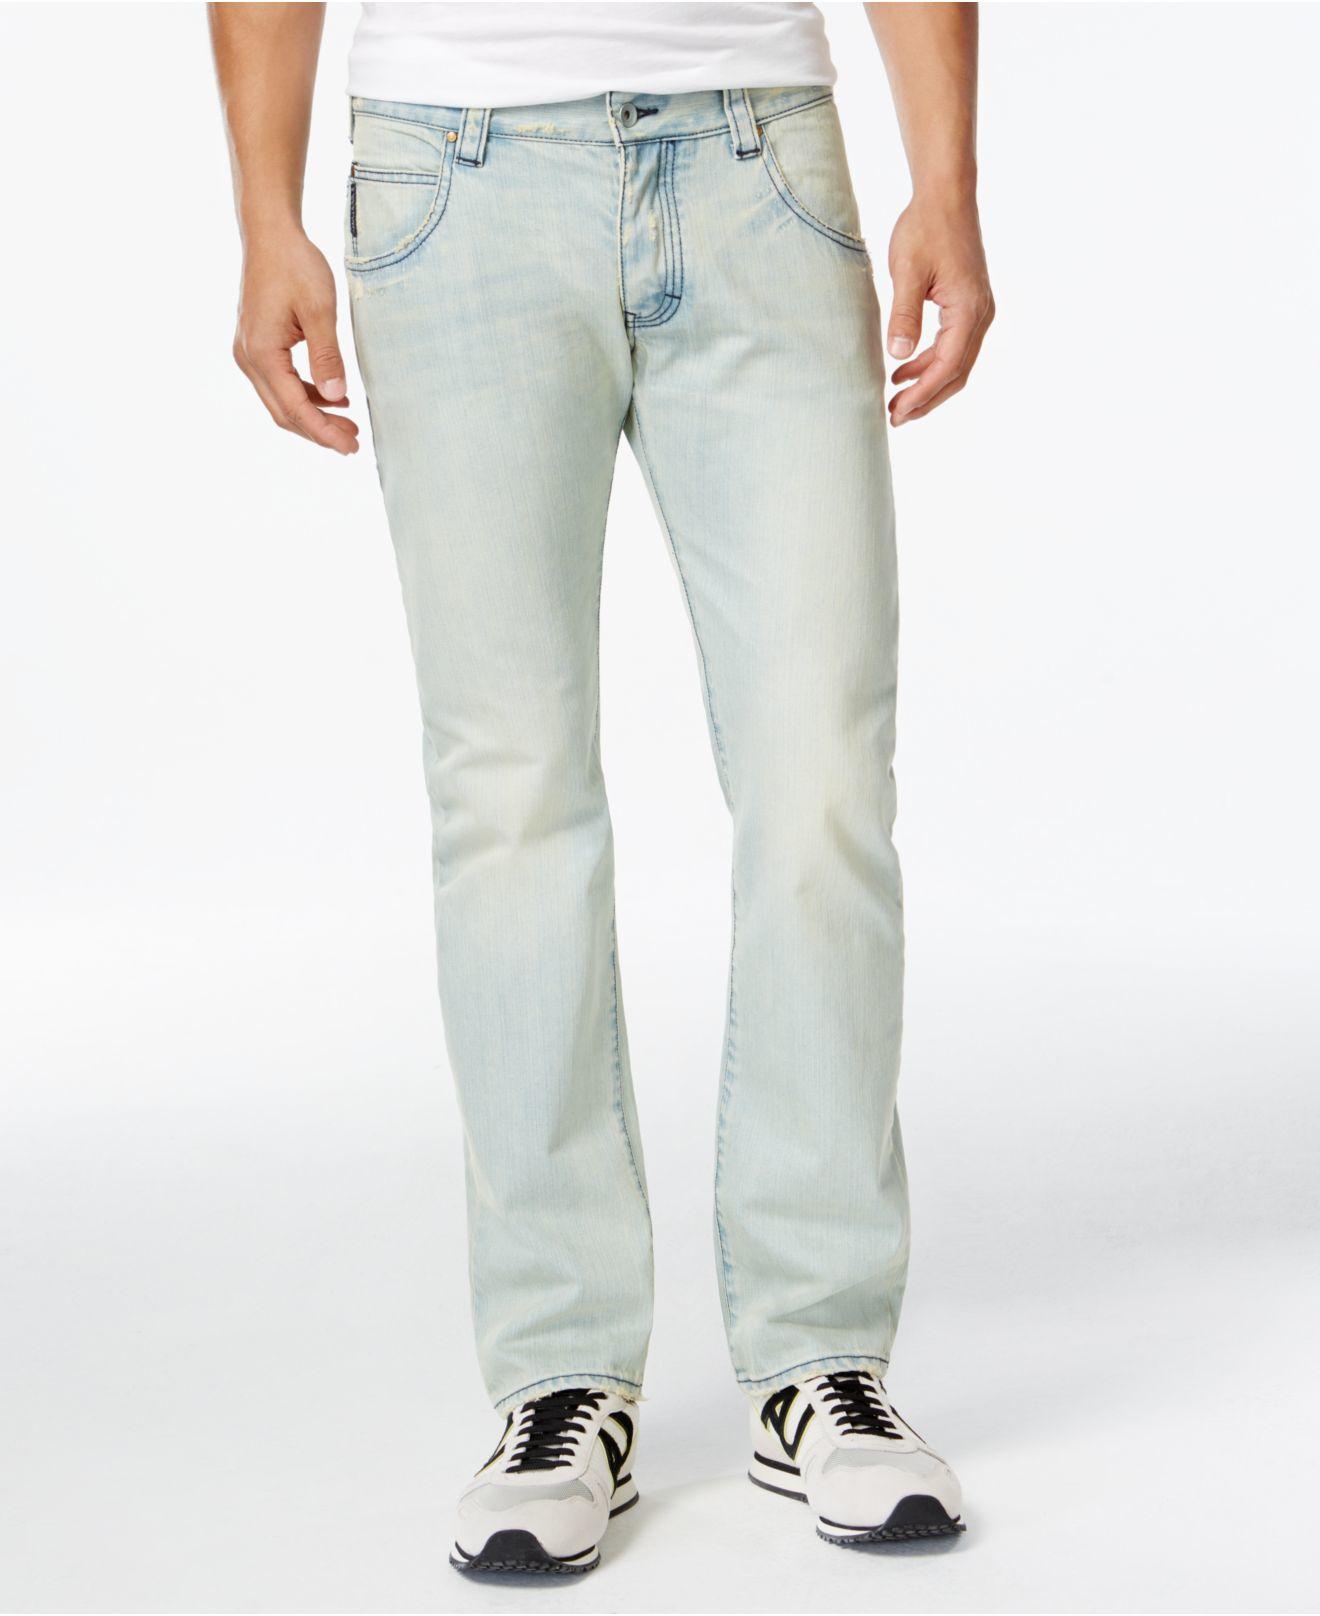 182afc76 Armani Jeans Blue Slim Straight Fit Light Wash Jeans for men